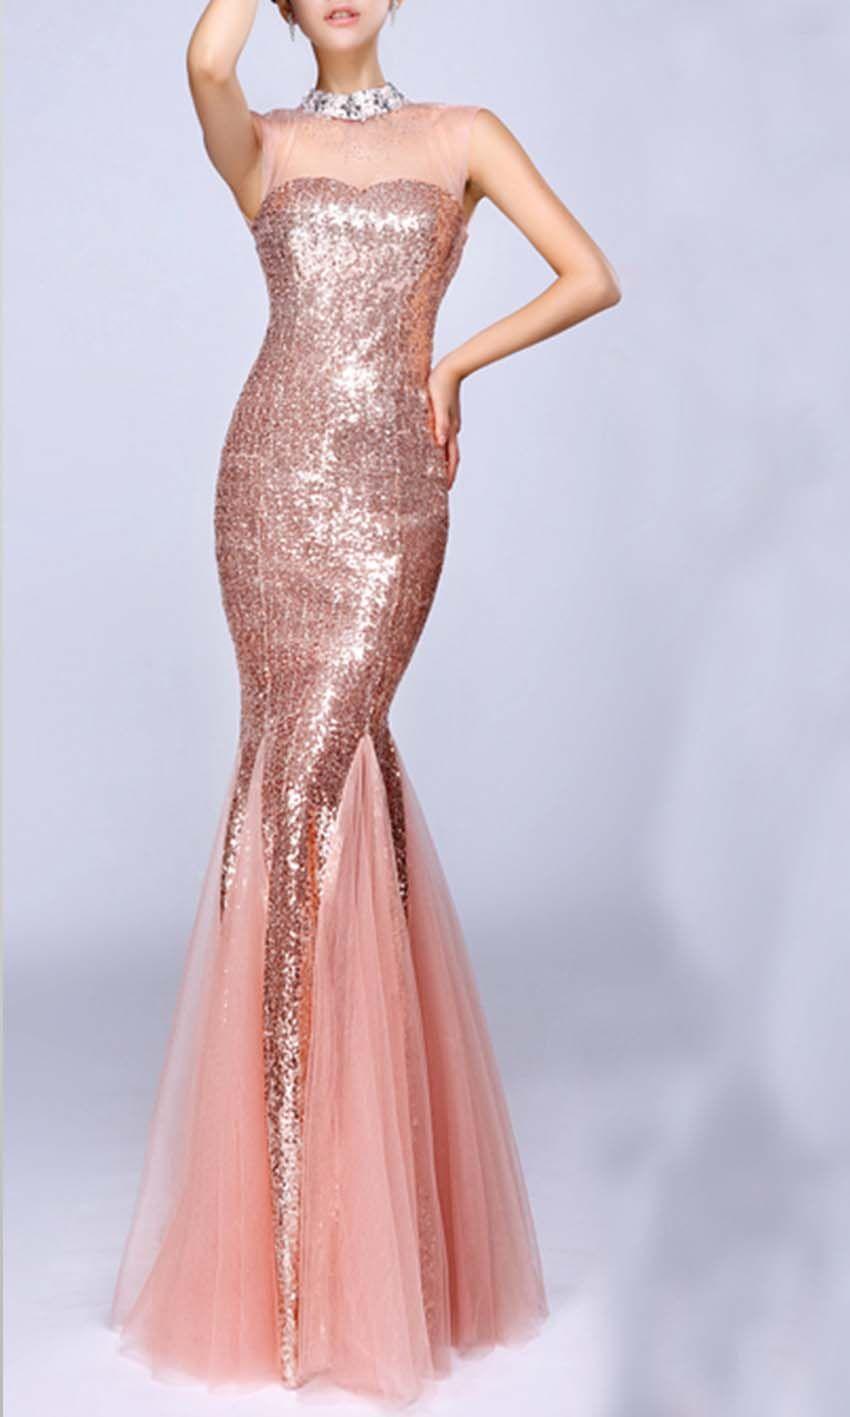 Pink Glitter High Neck Mermaid Long Prom Dress KSP354 | Prom Dresses ...